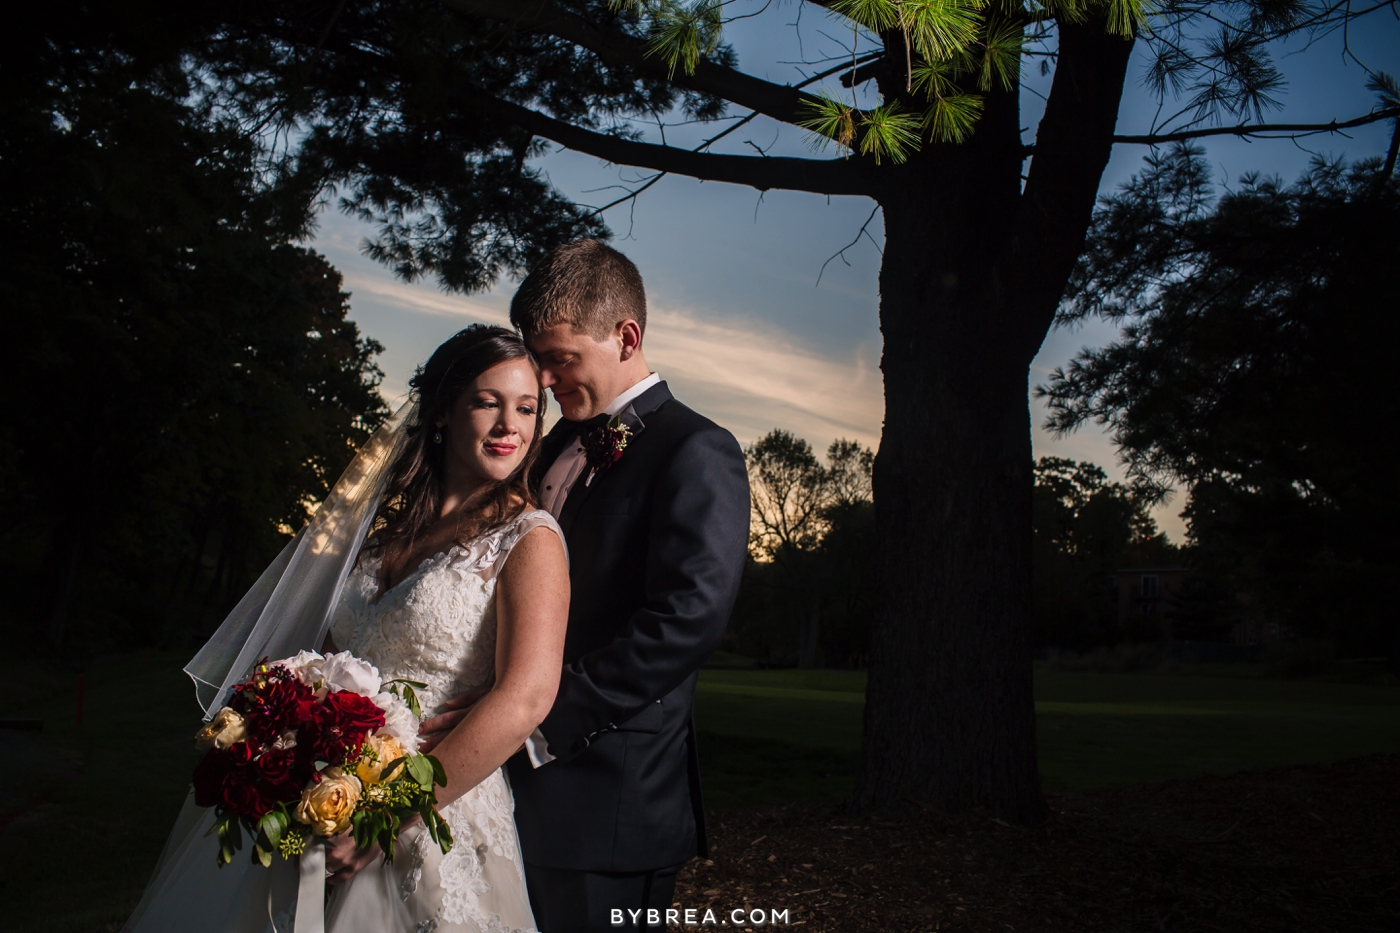 Baltimore wedding photo bridal portrait at sunset